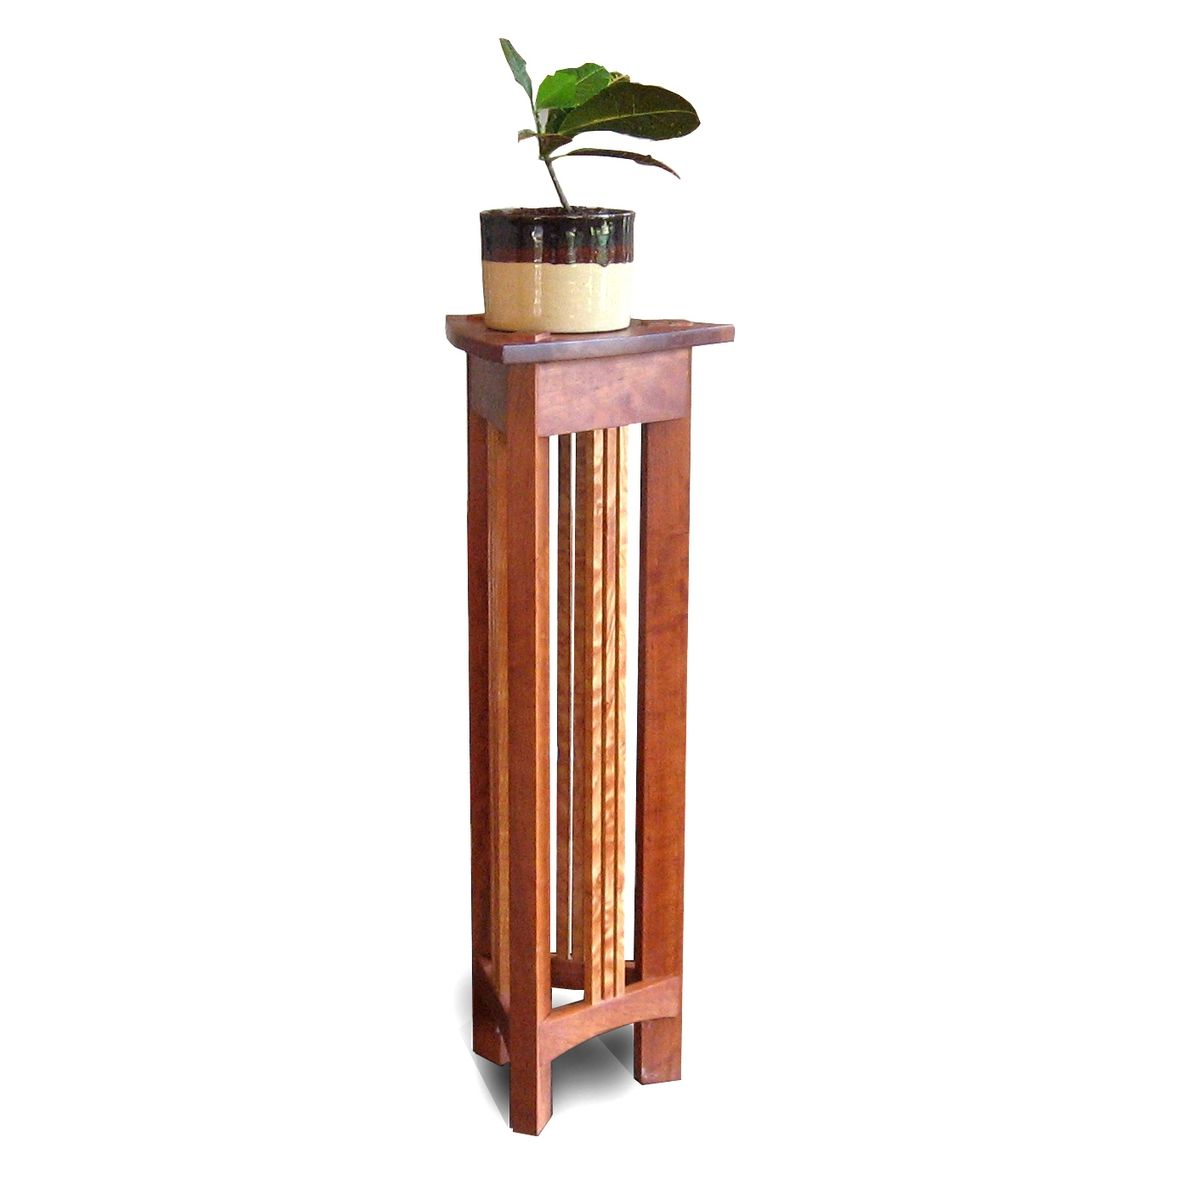 Tall Corner Plant Stand Plans Diy Free Download Varnish